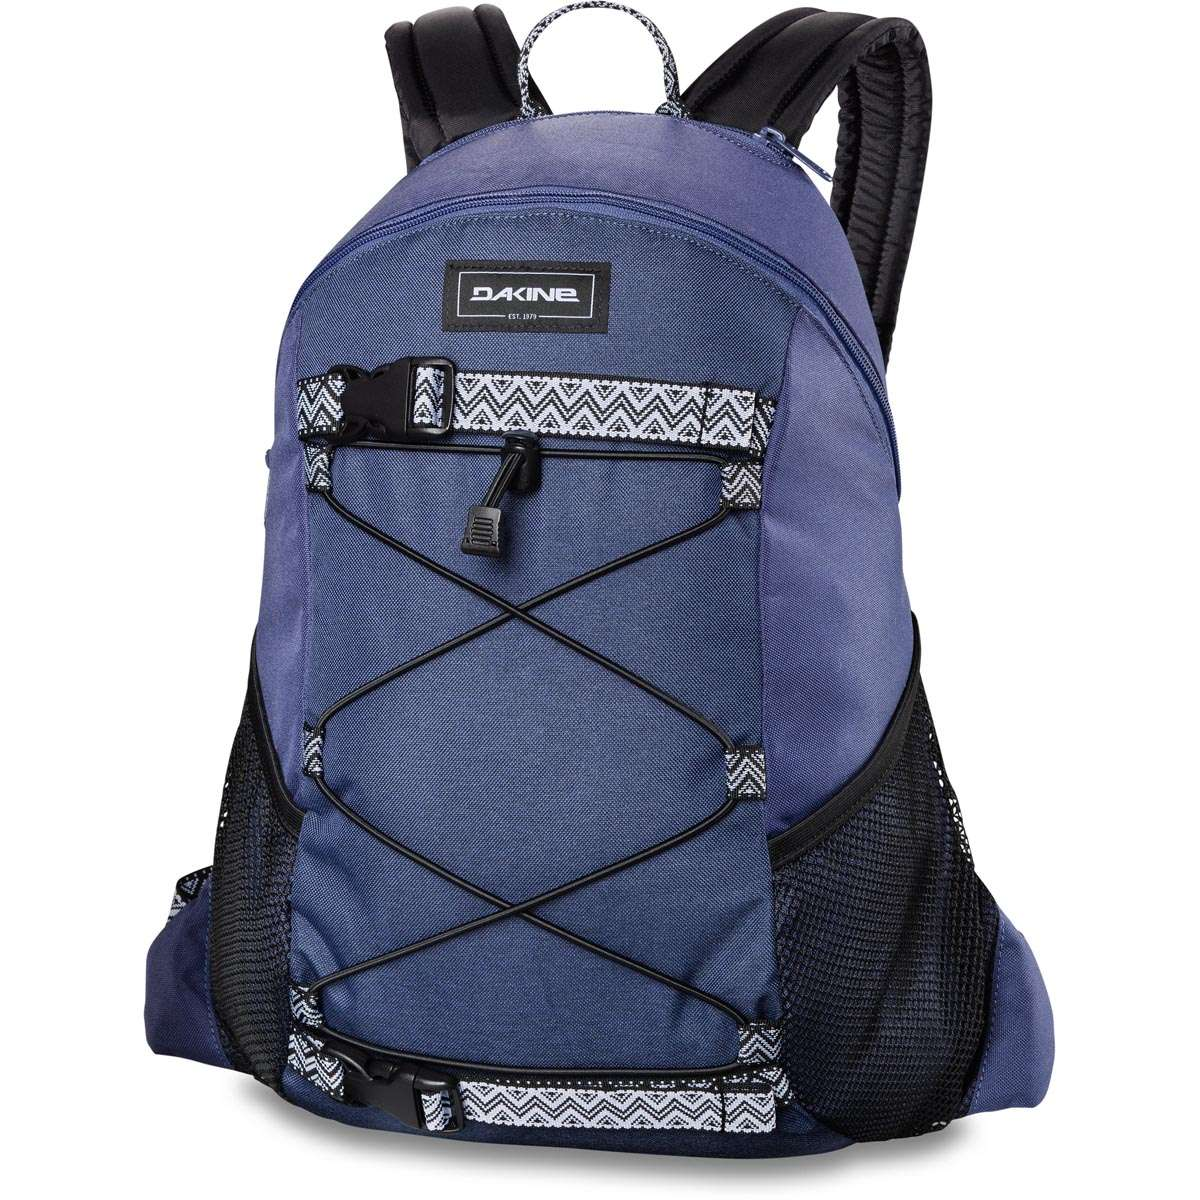 ca42c703ba3 Dakine Wonder 15L Backpack Seashore | Dakine Shop